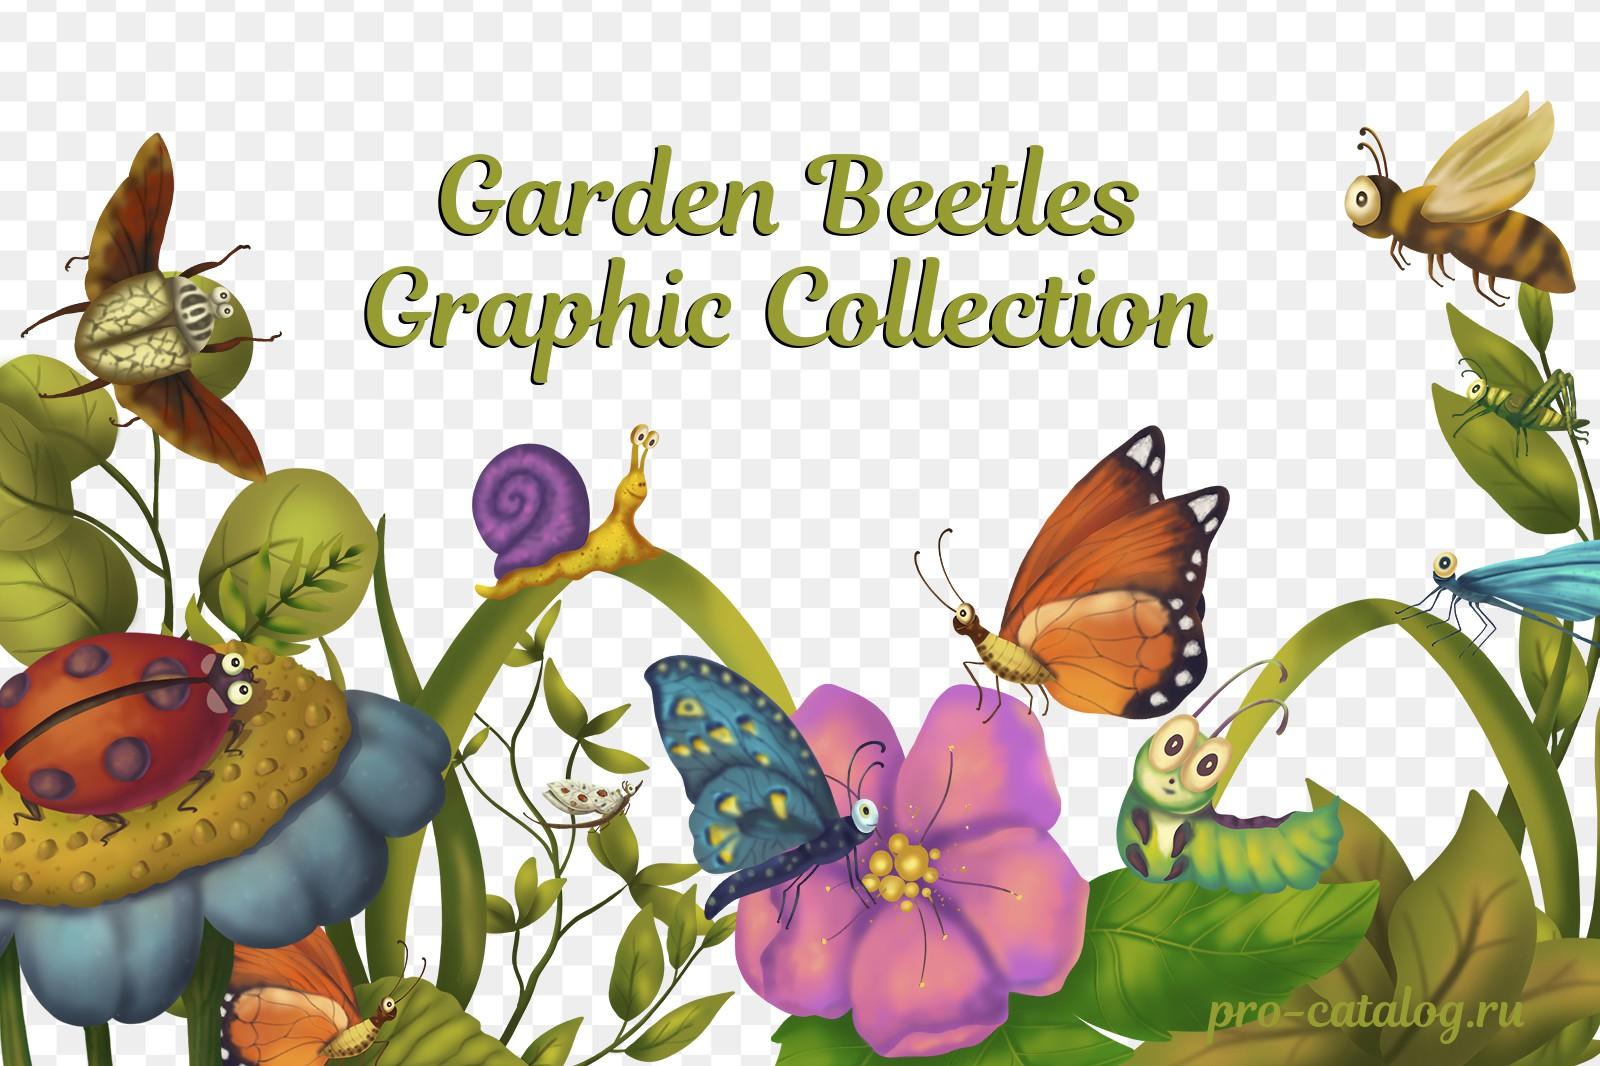 Garden beetles Graphic collection | Растровый клипарт png